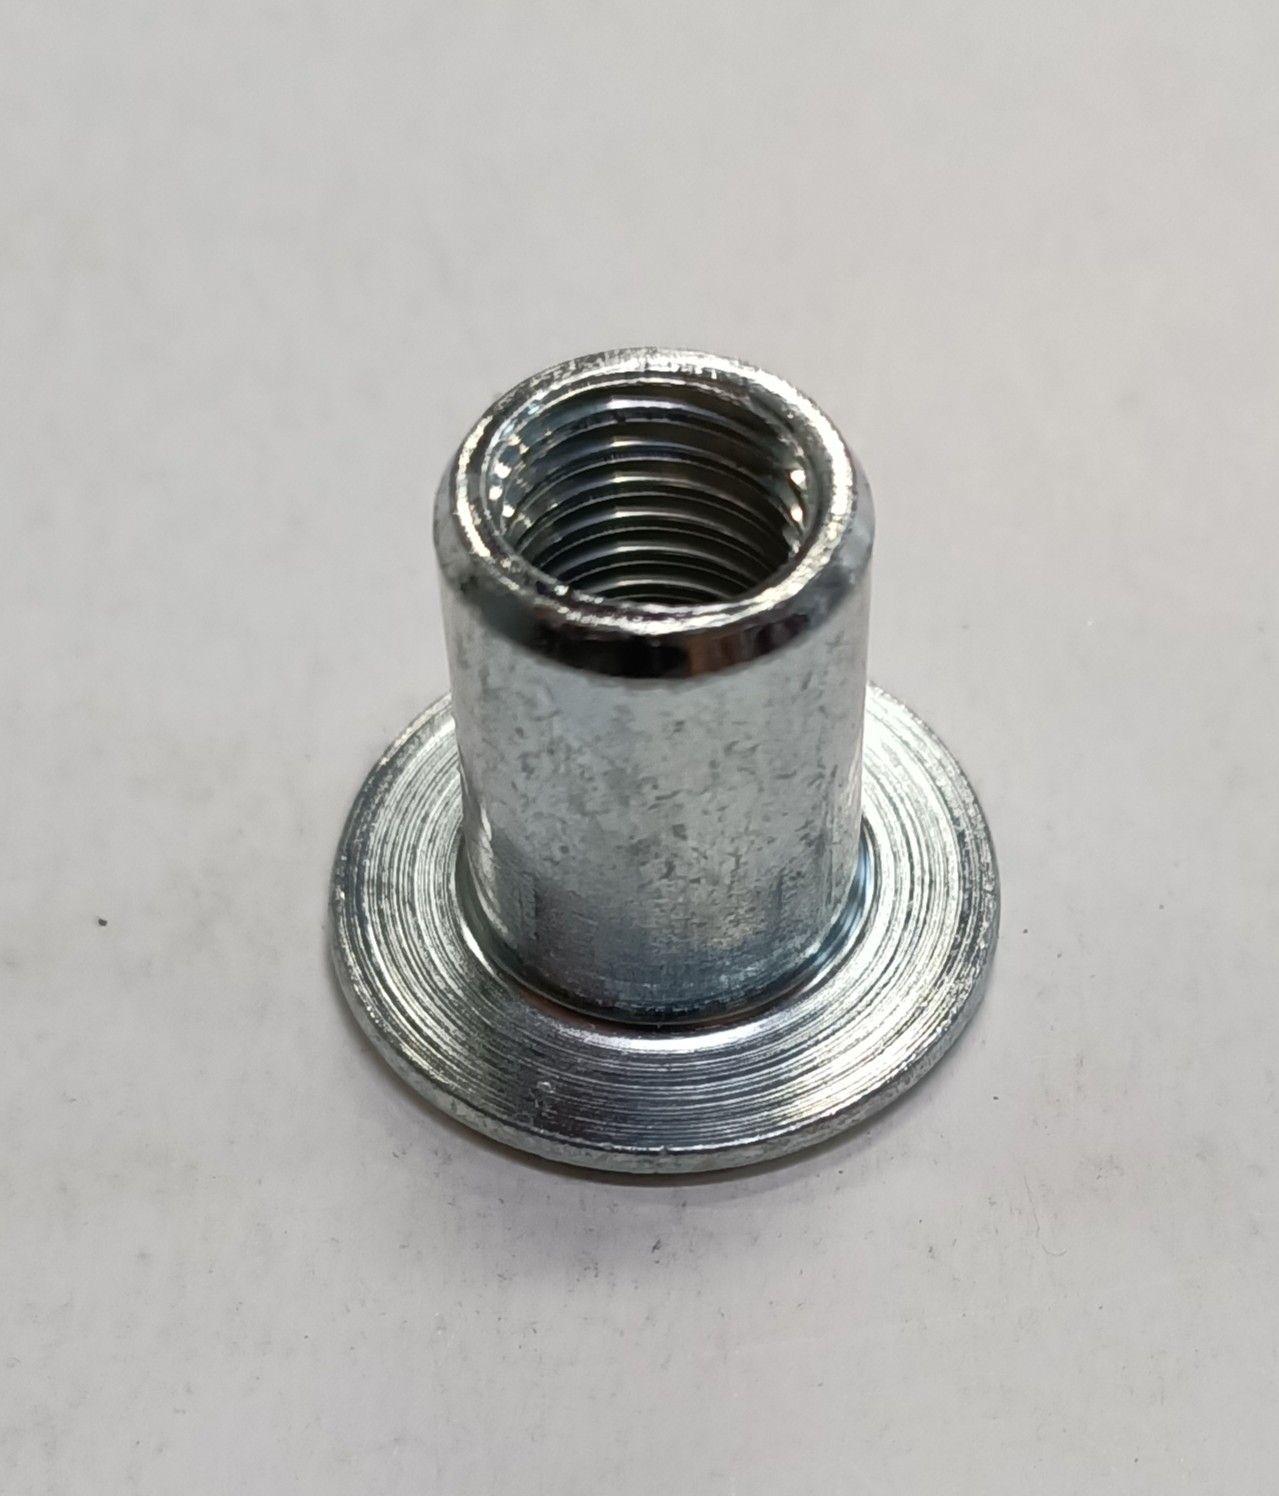 Dado cieco acciaio zincato cilindrico filetto mm 10 testa piana larga con incasso esagonale